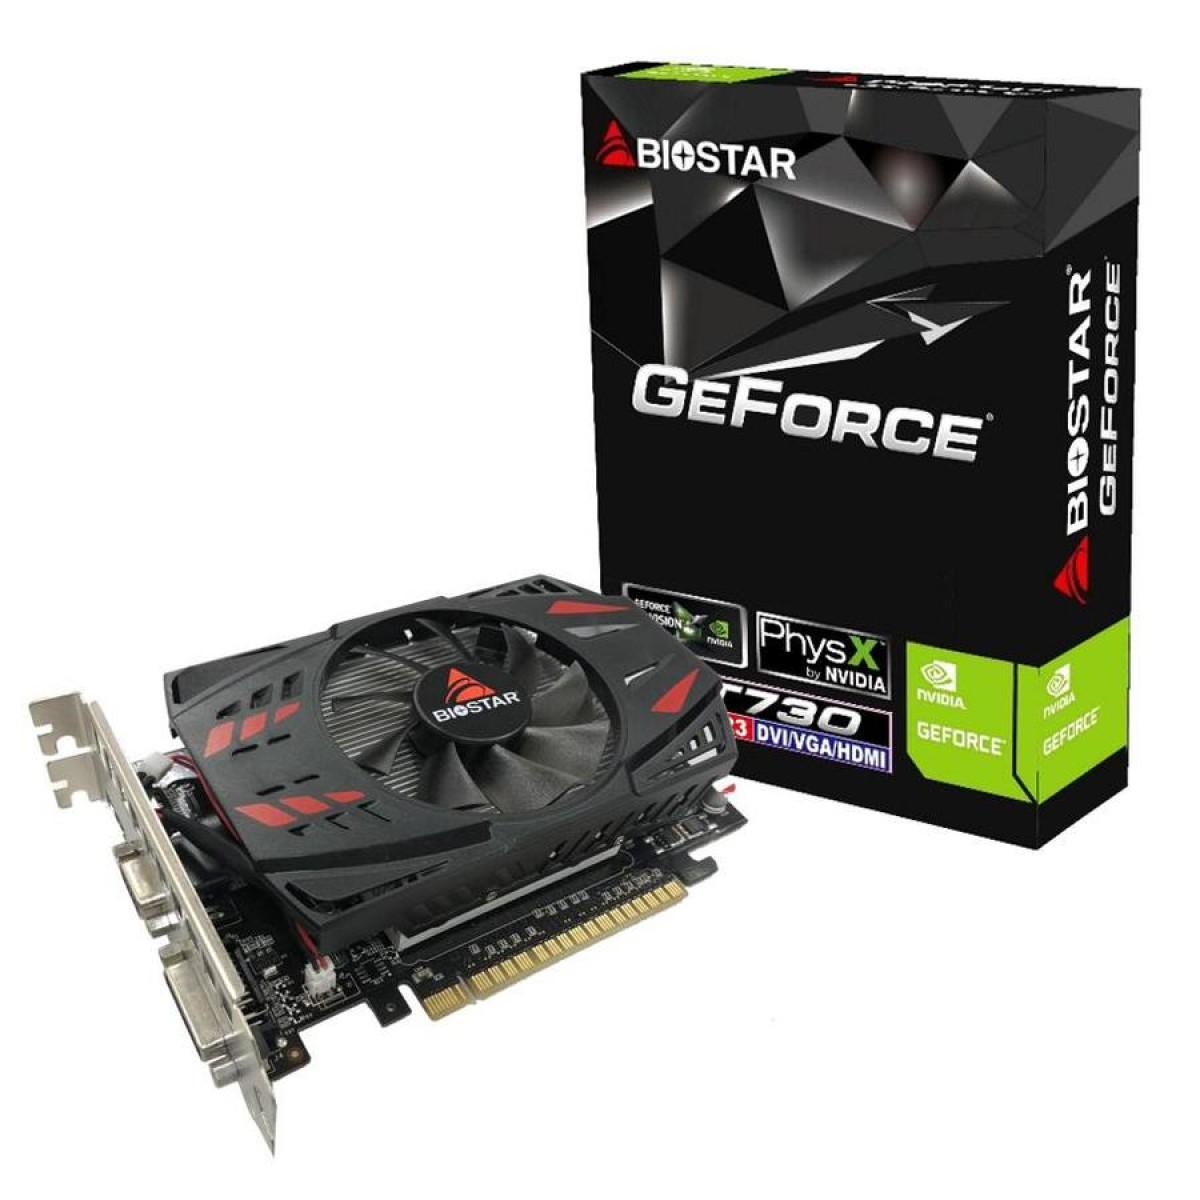 Placa de Vídeo Biostar, GeForce, GT 730, 2GB, GDDR5, 128Bit, VN7315THX1-TB1RA-BS2